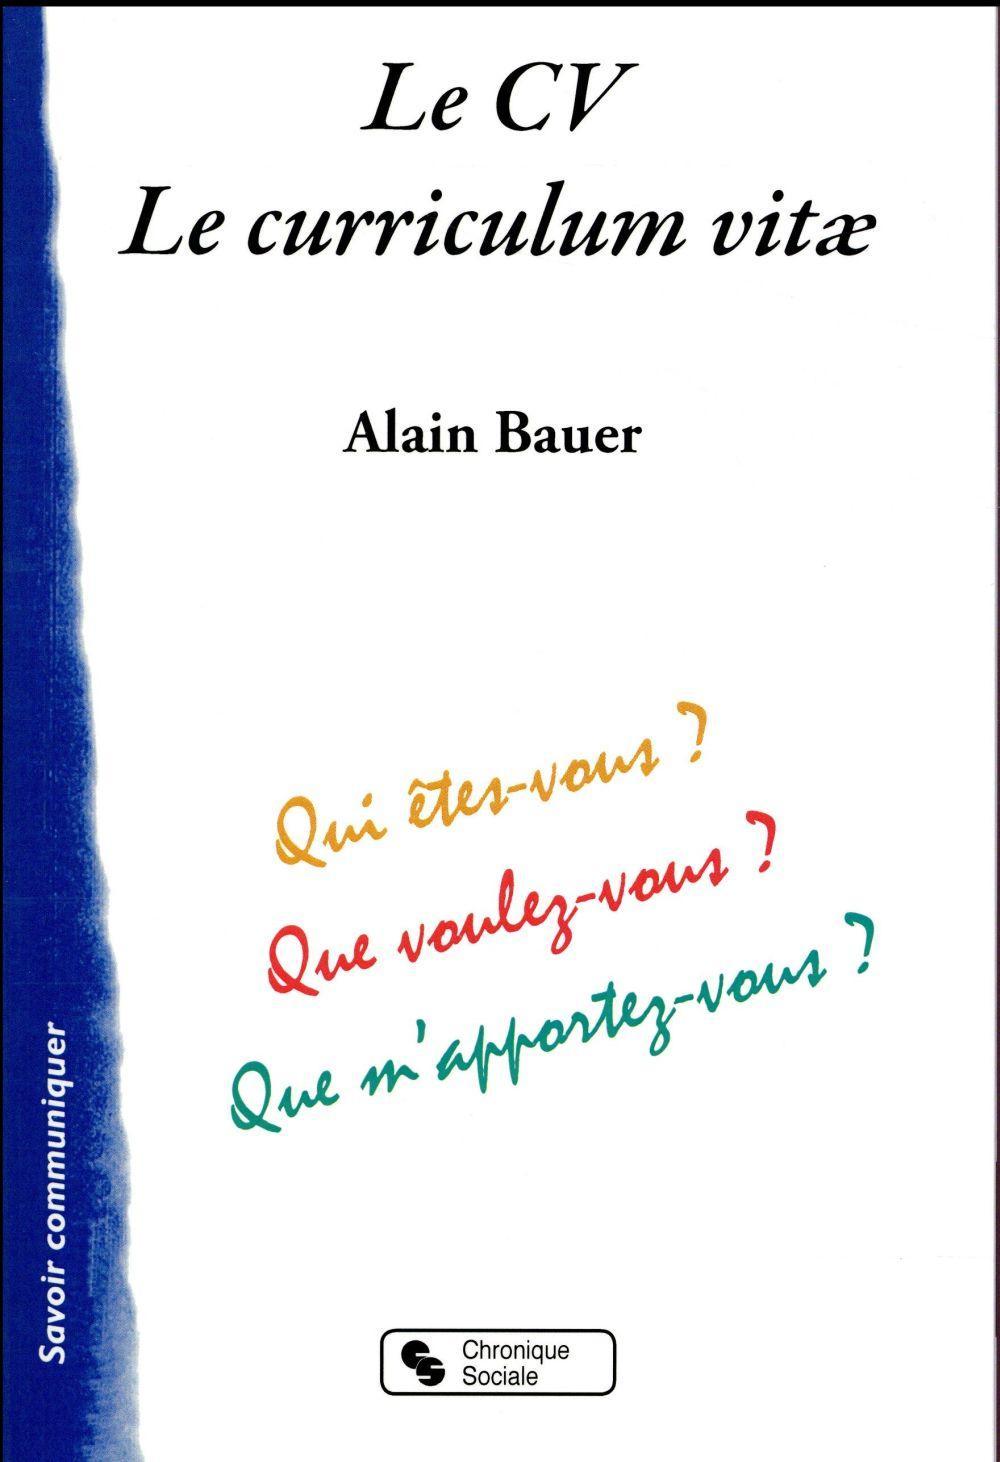 le cv   le curriculum vitae - alain bauer - livre